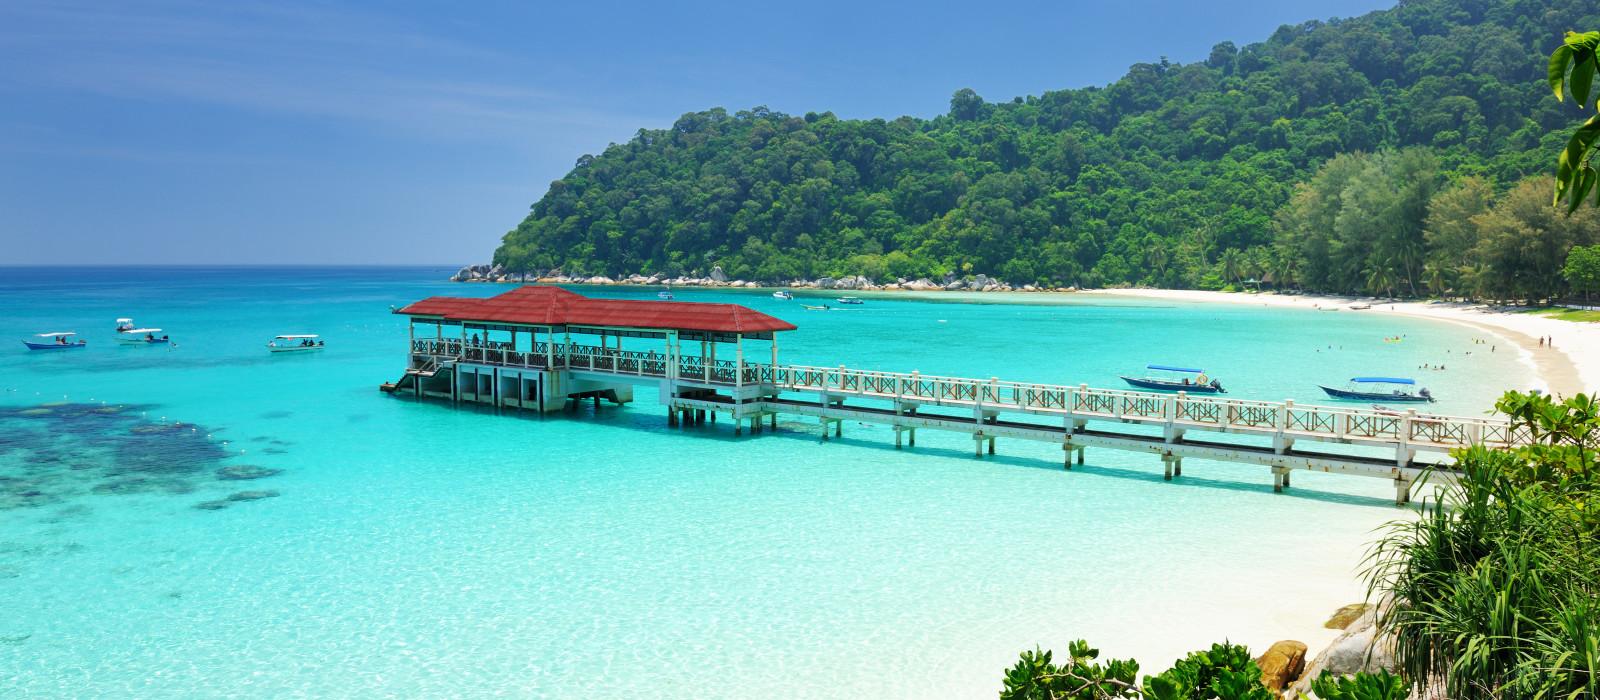 Destination Perhentian Islands Malaysia